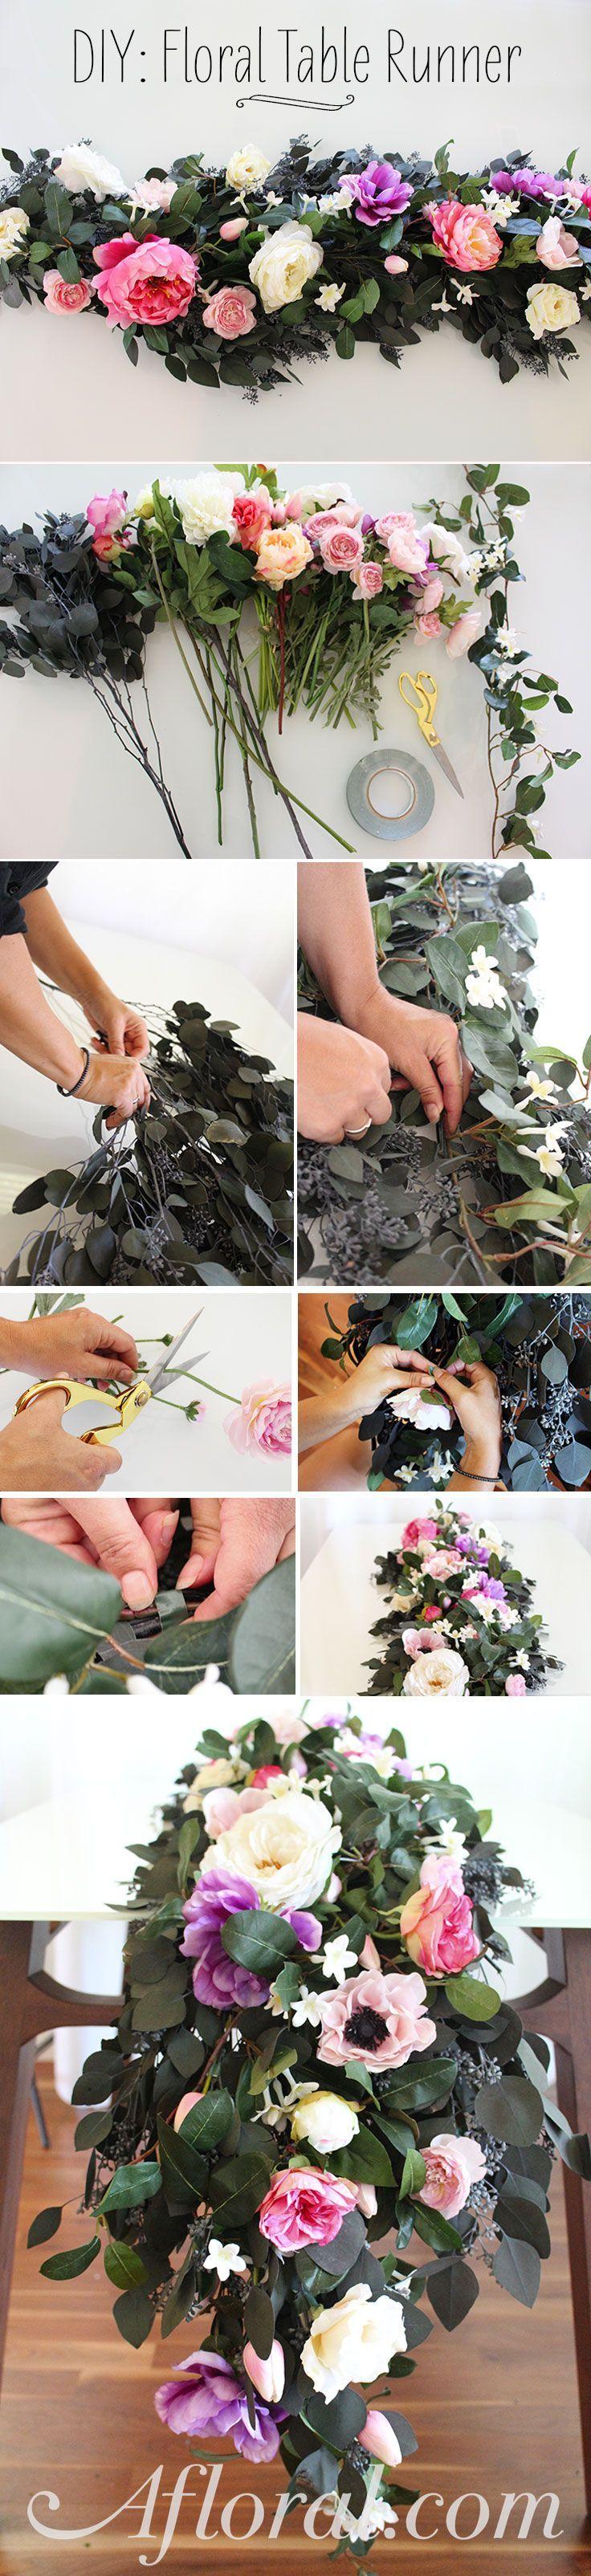 Diy floral table runner flower centerpieces wedding diy